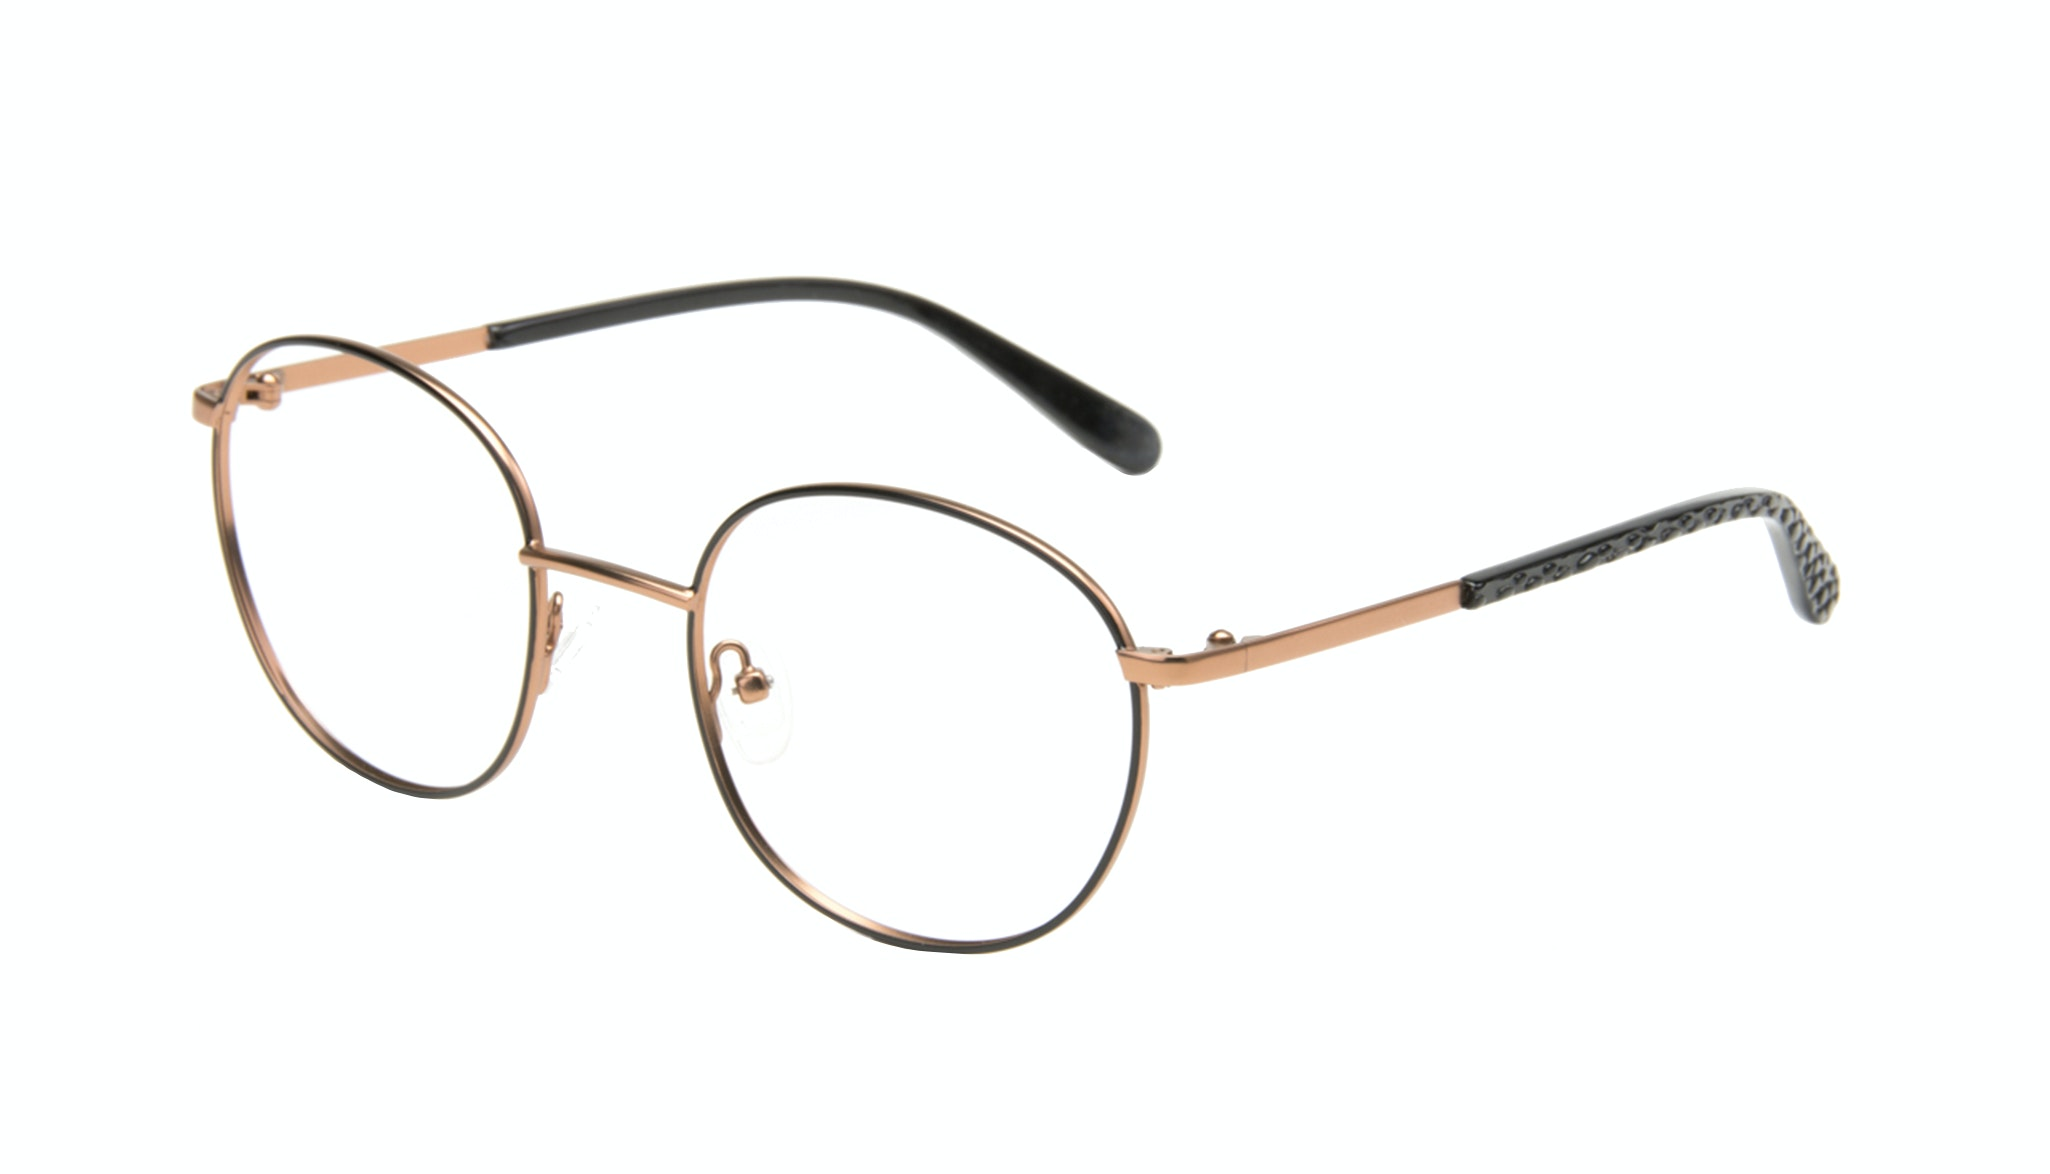 Affordable Fashion Glasses Round Eyeglasses Women Joy Black Copper Tilt